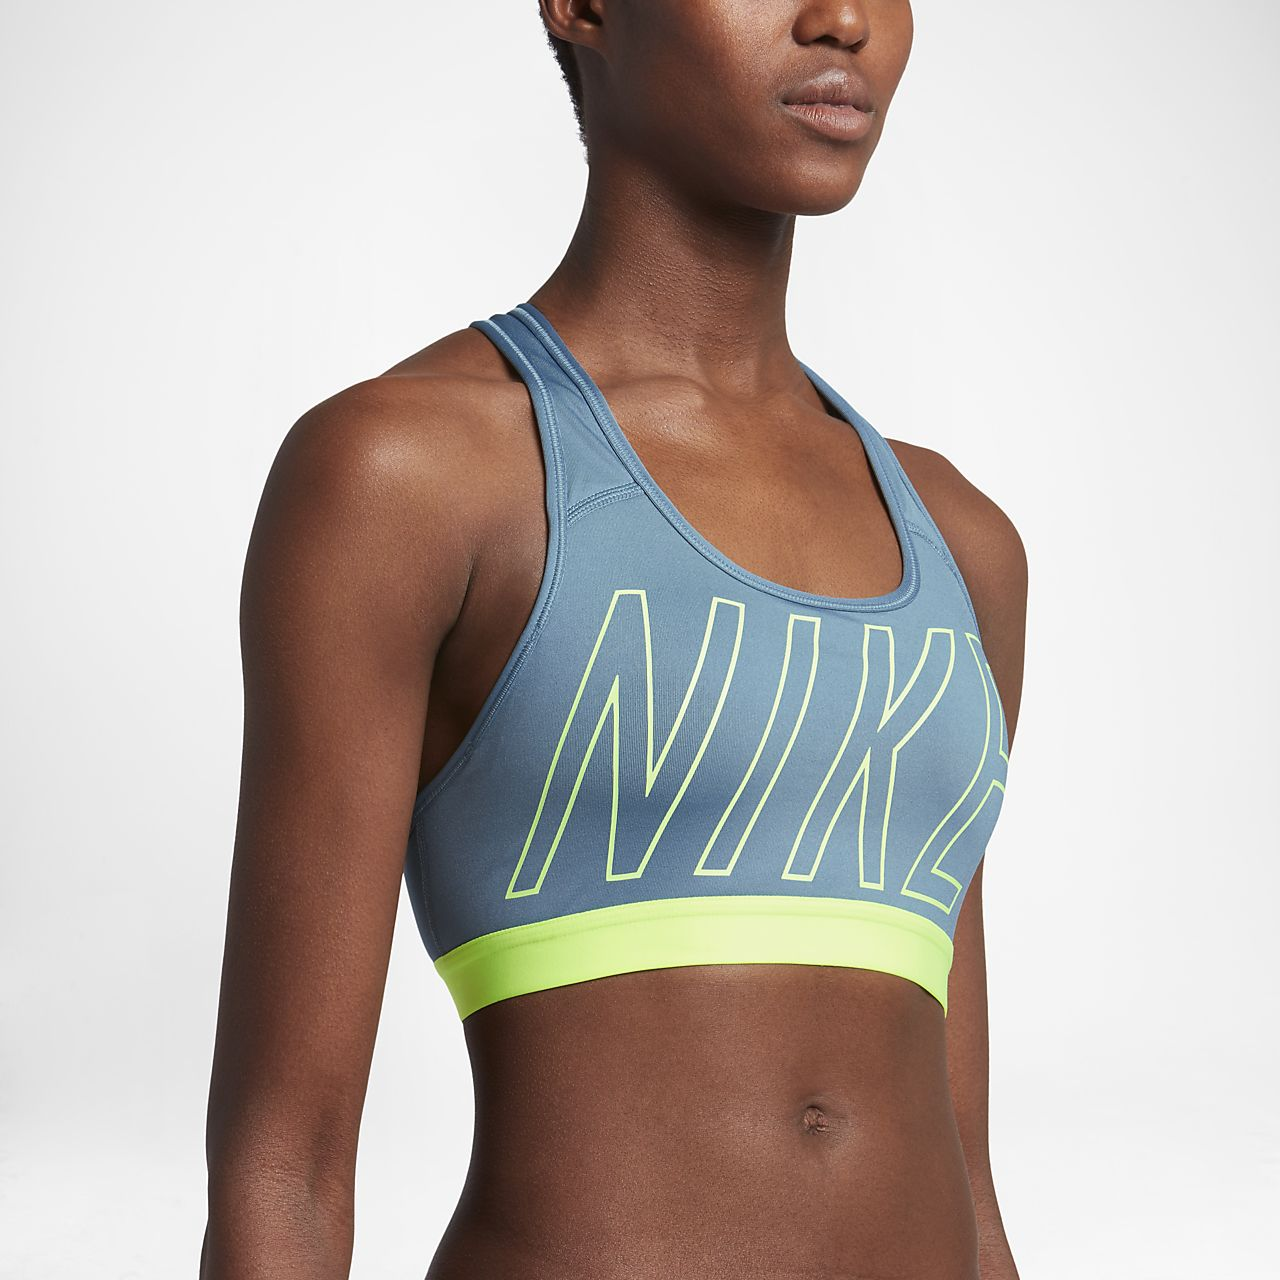 0c7e81e18c Nike Classic Women s Medium Support Sports Bra. Nike.com SG